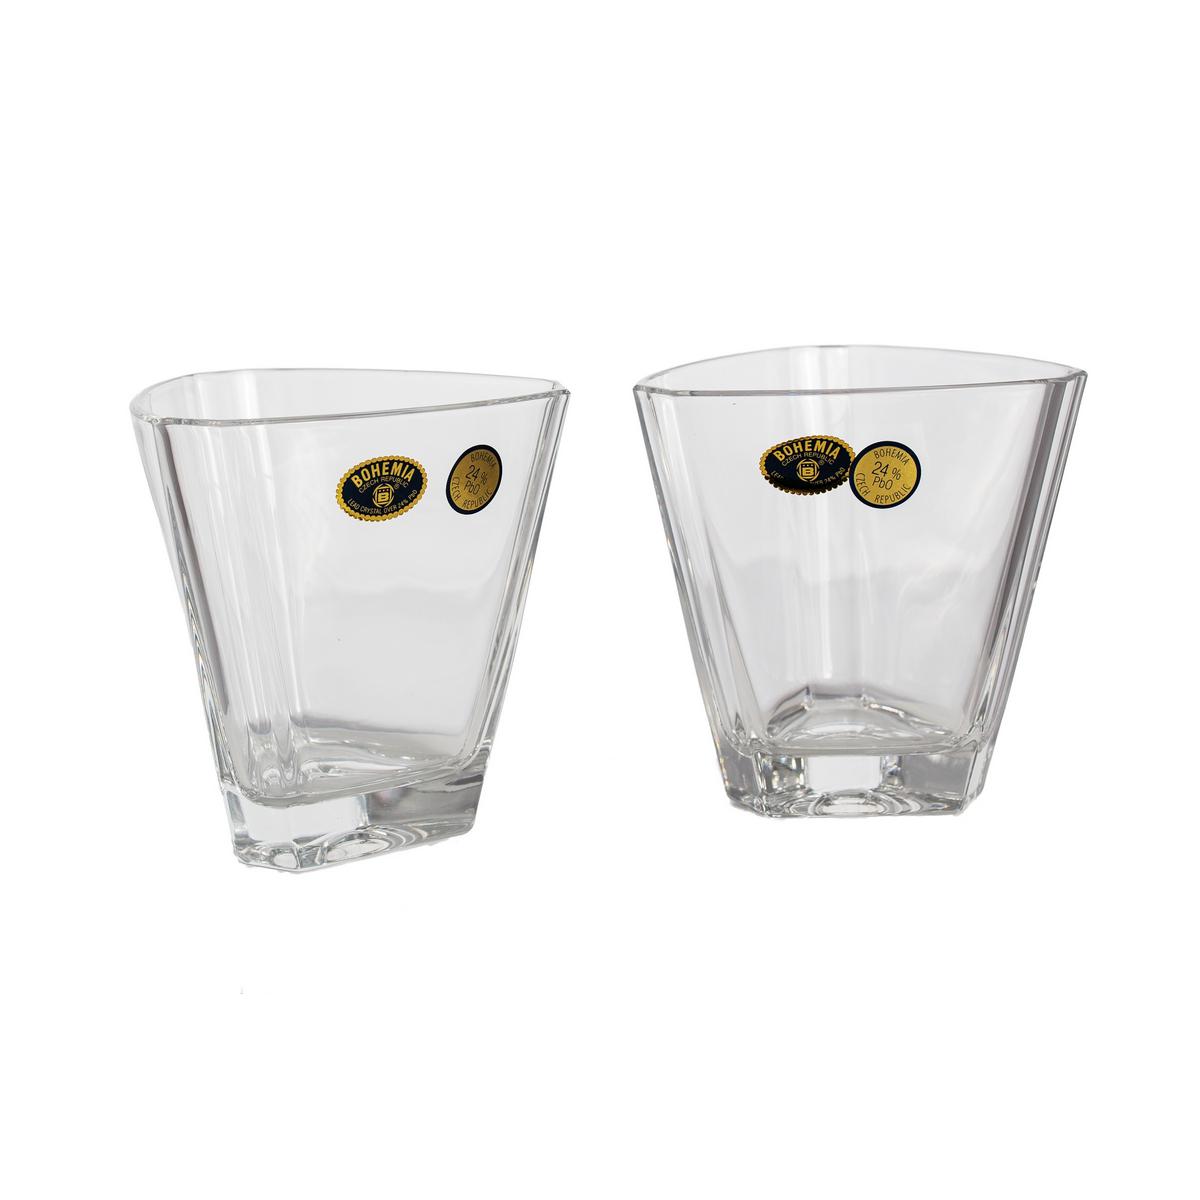 Set 6 Pahare Cristal Whisky 270 Ml (58808) 2021 aranjareamesei.ro